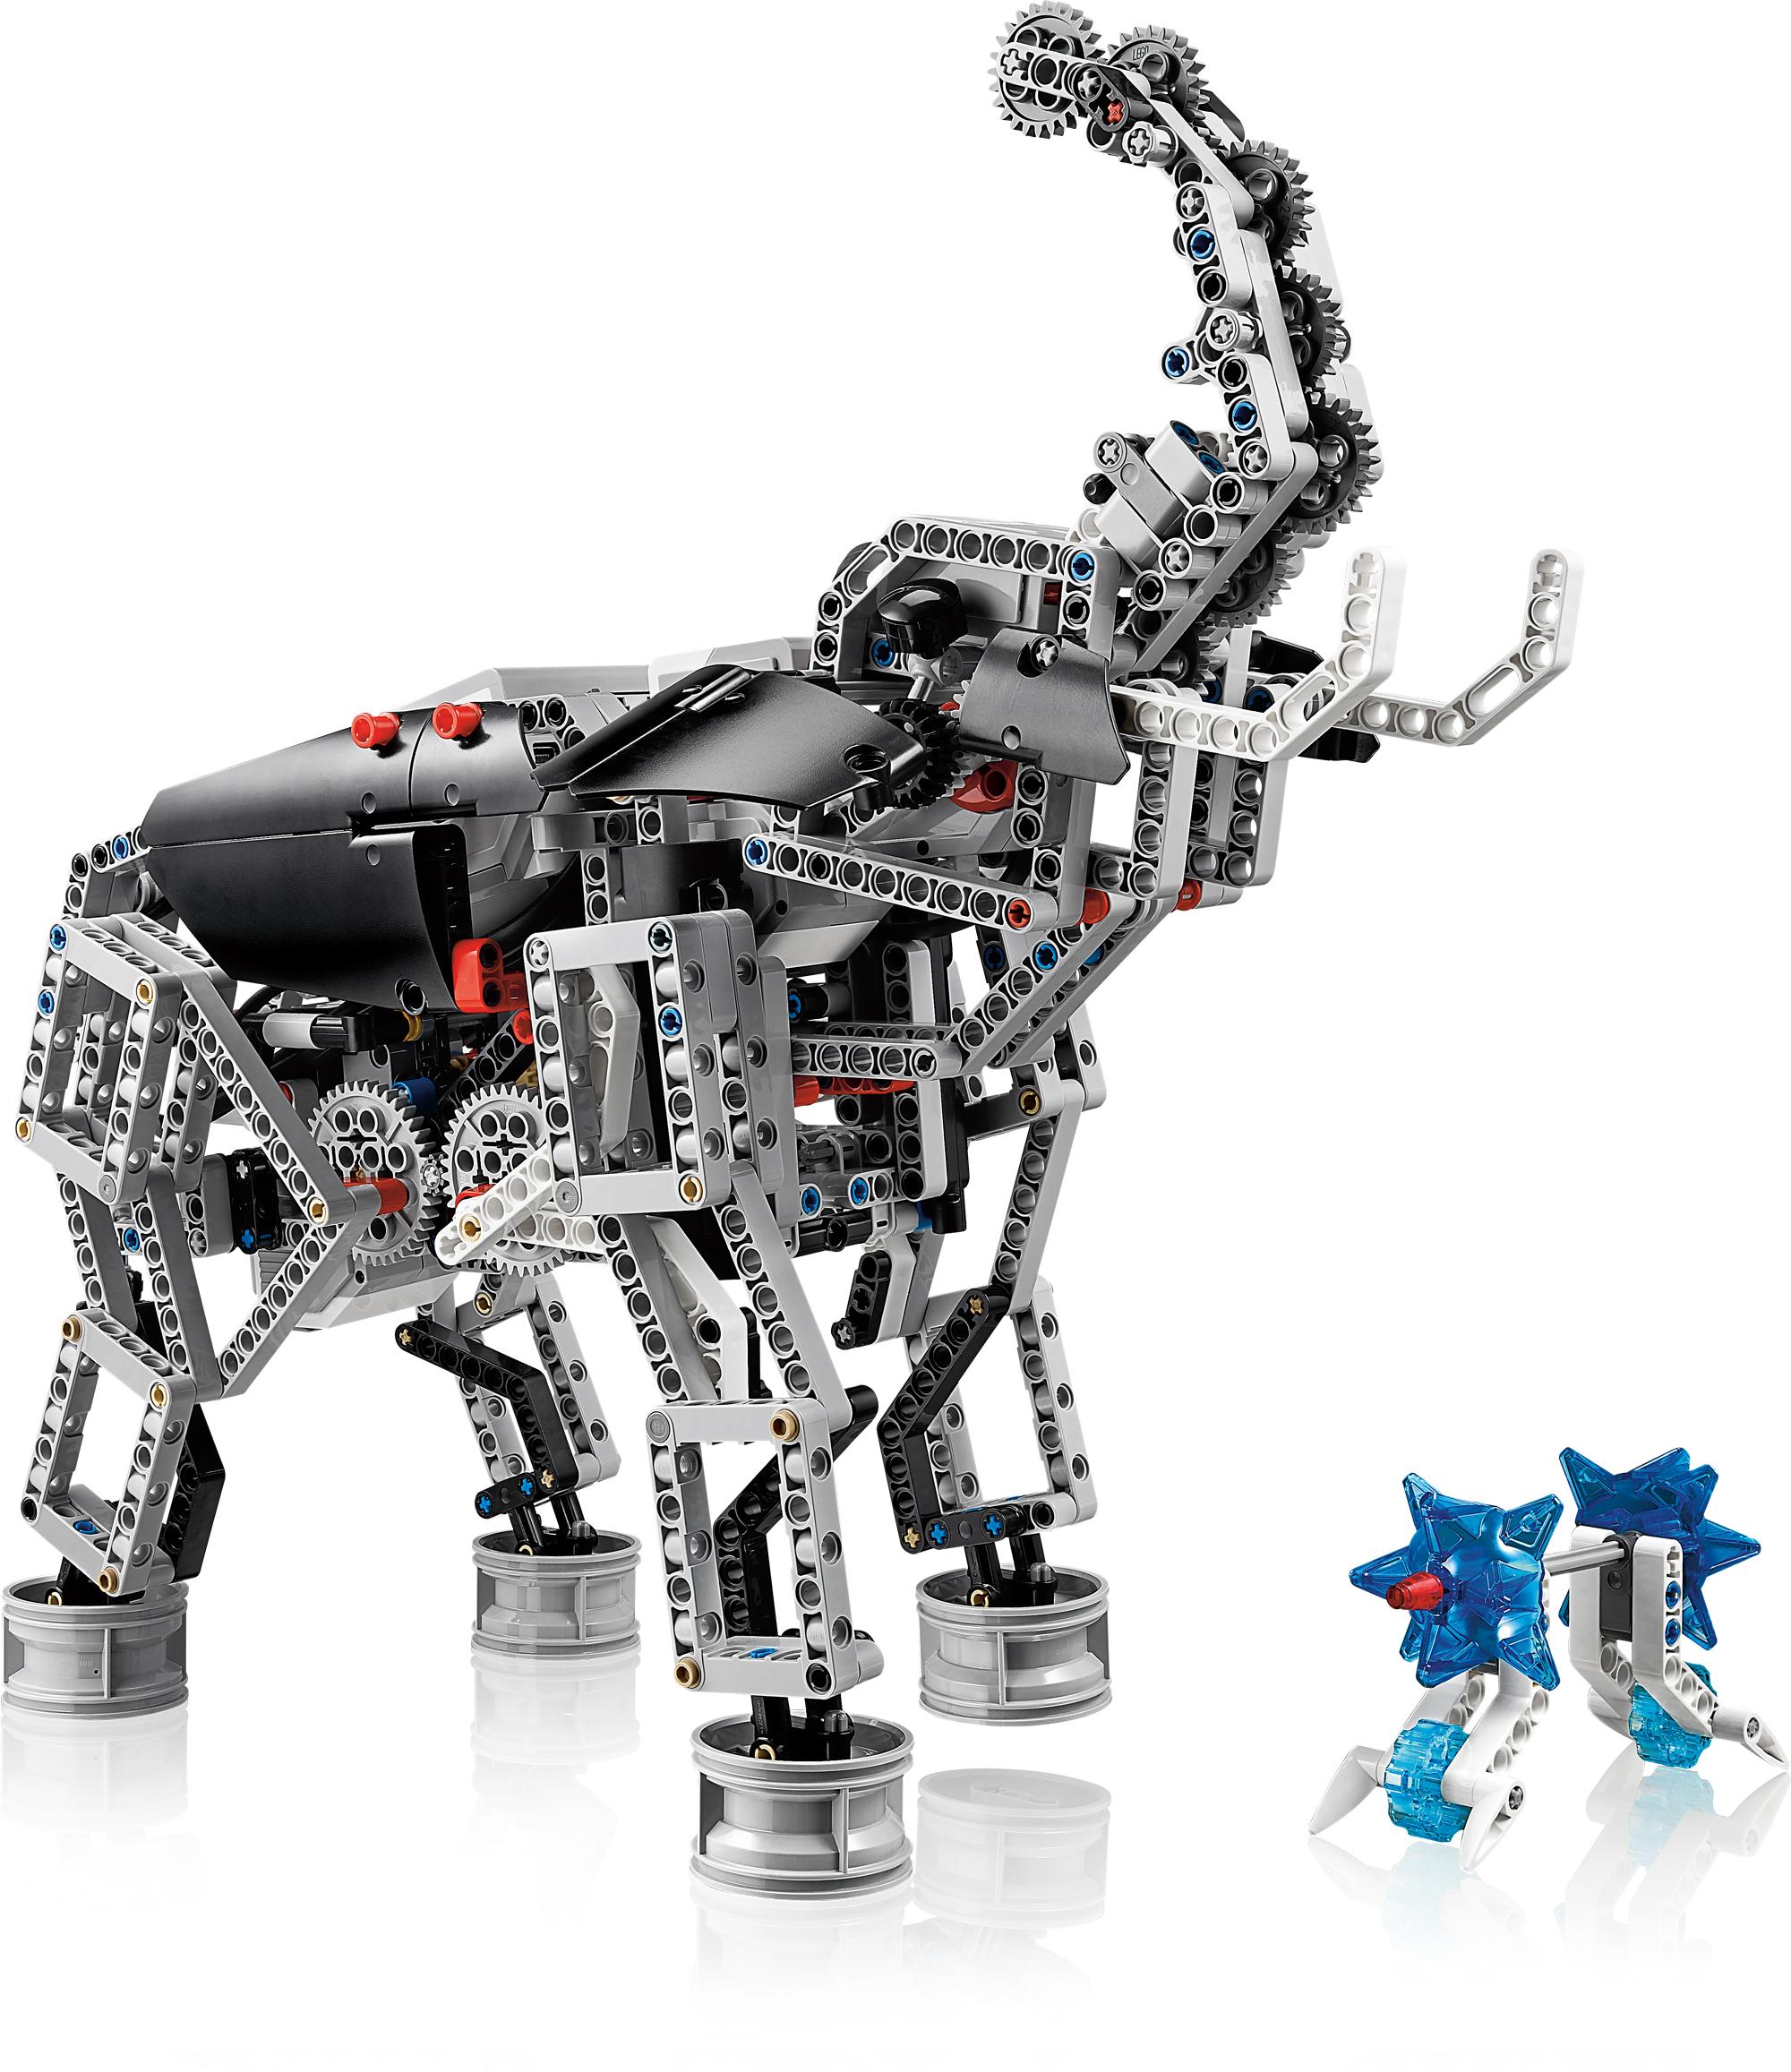 Lego Mindstorms EV3: Neue Roboterplattform von Lego - Lego Mindstorms EV3: Elephant